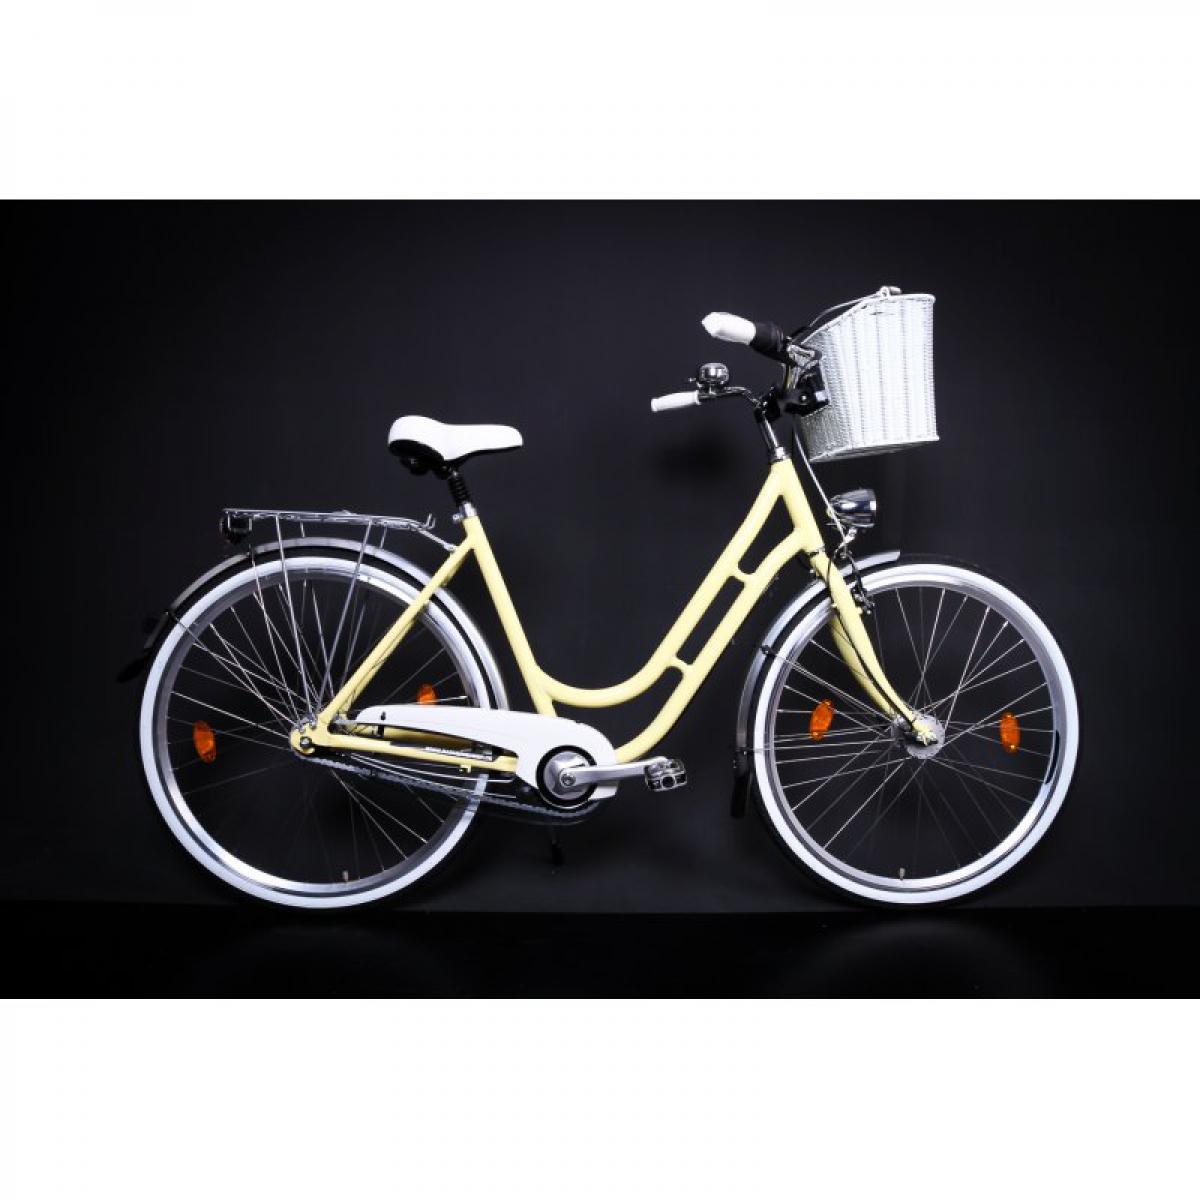 28 zoll alu mifa damen fahrrad city bike shimano 7 gang nexus nabendynamo gelb korb ihr. Black Bedroom Furniture Sets. Home Design Ideas